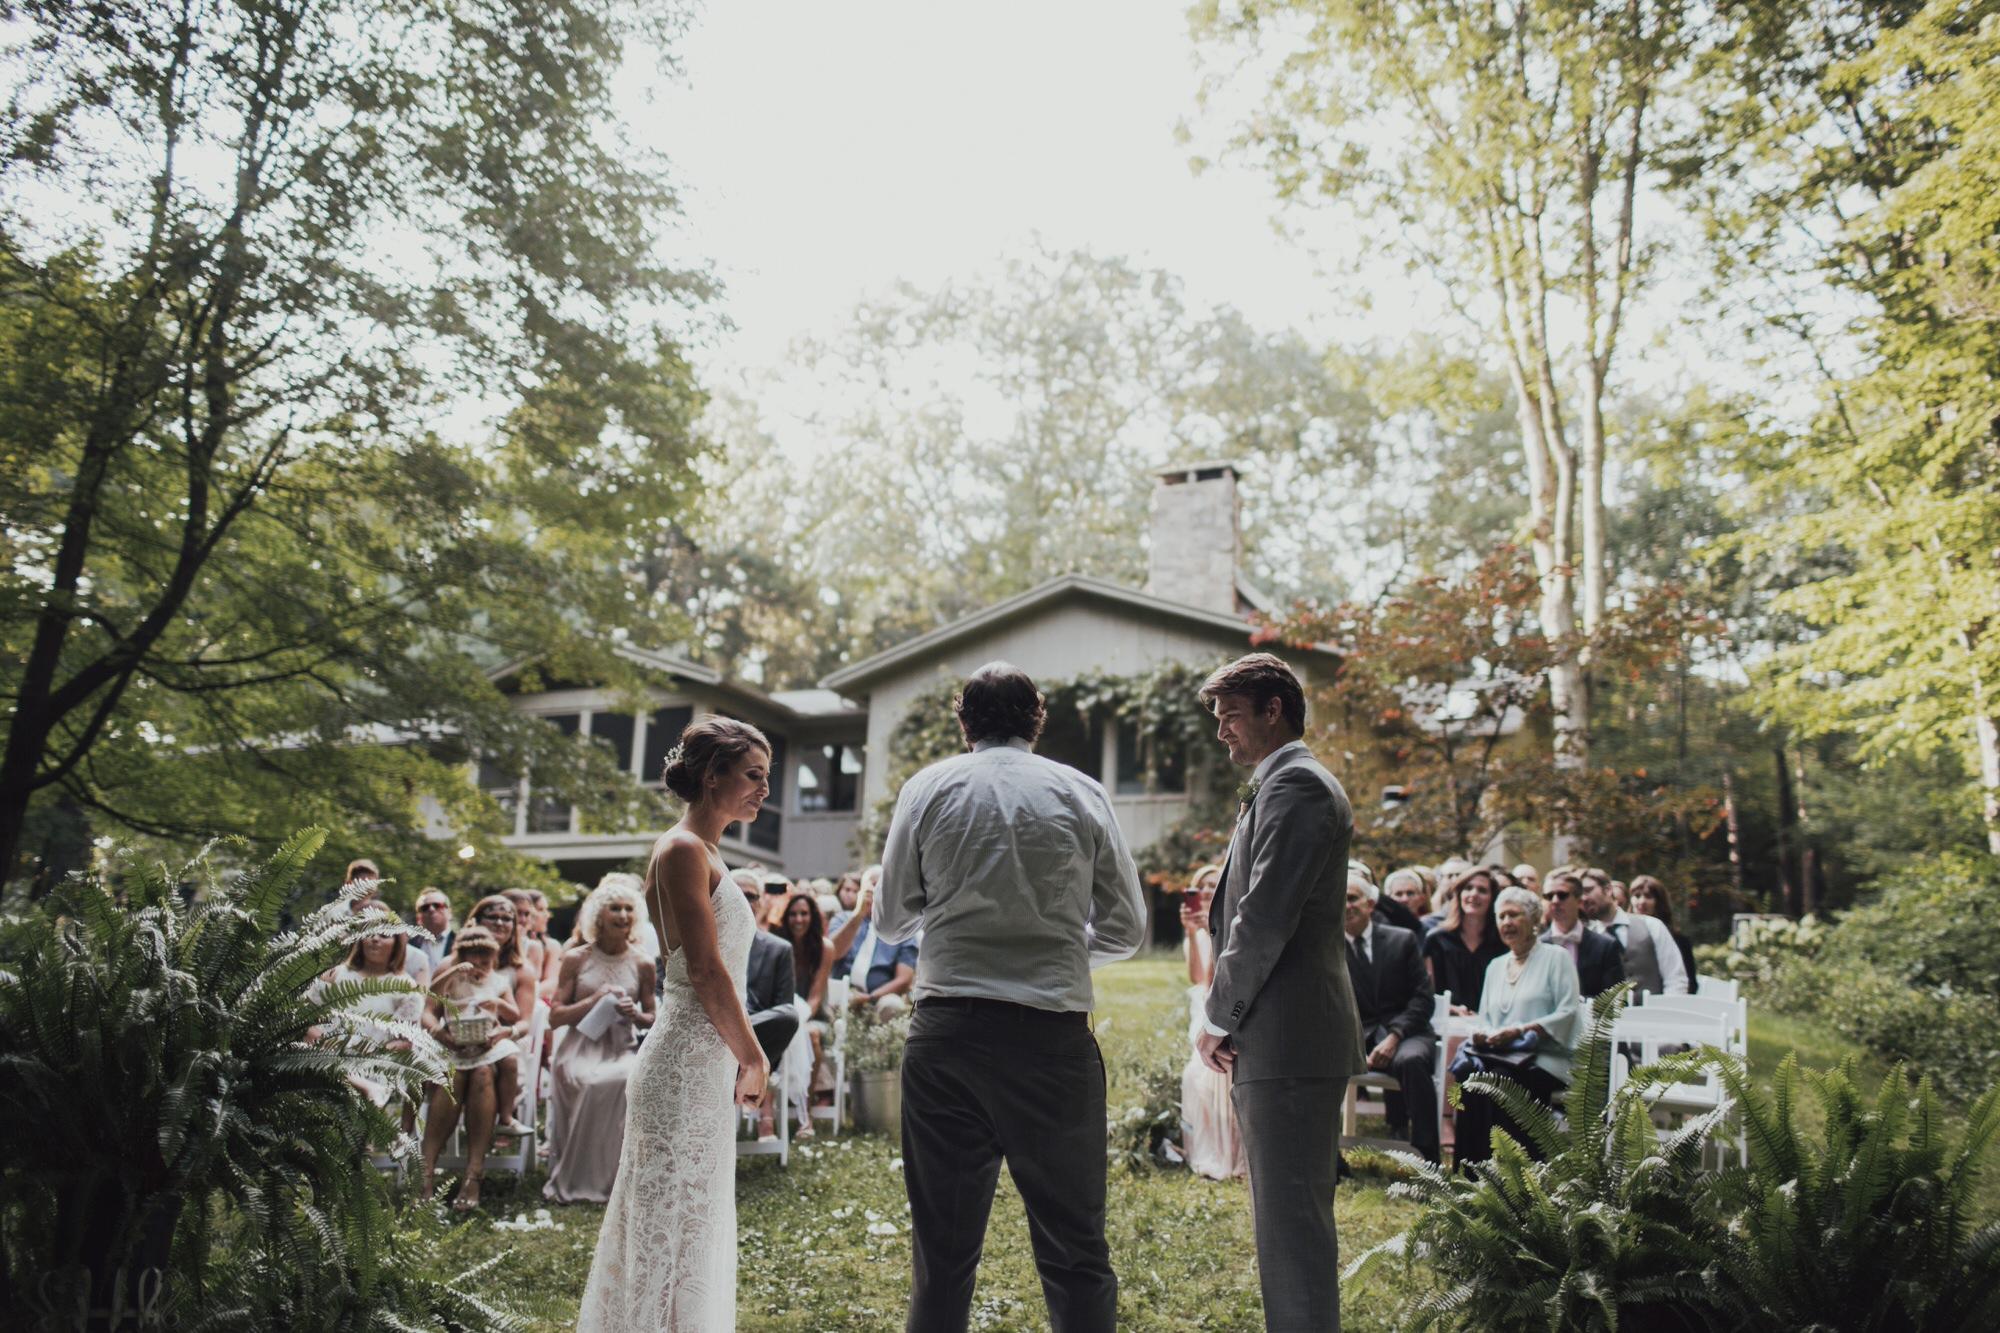 emily-aaron-rochester-new-york-wedding-photographer-64.JPG